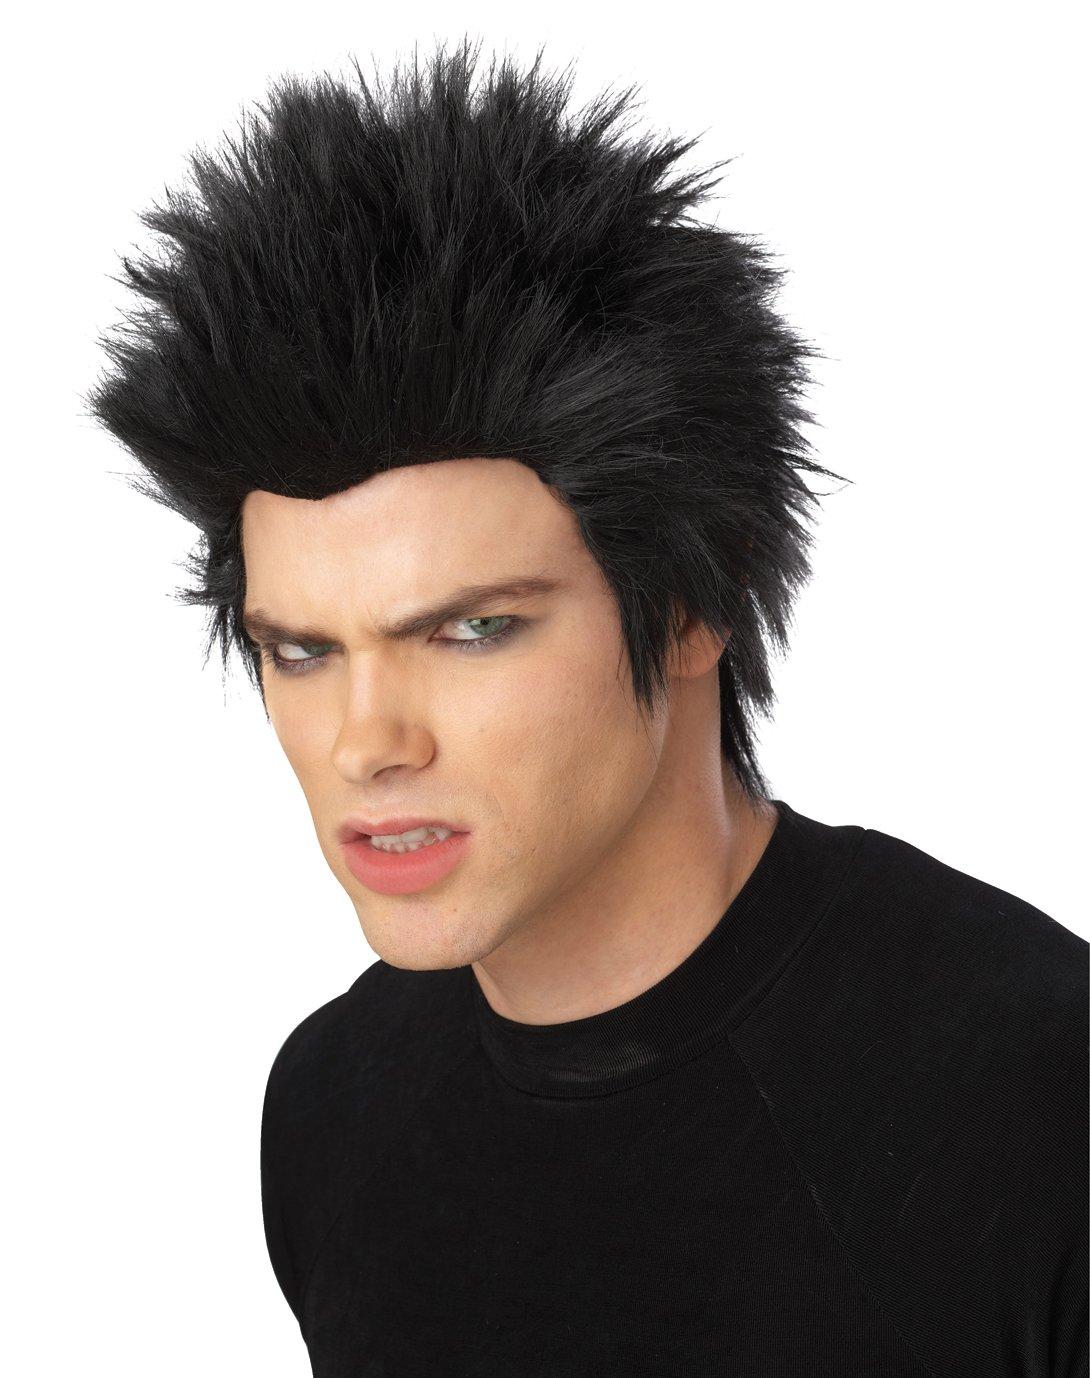 Wolf Boy Adult Costume Wig